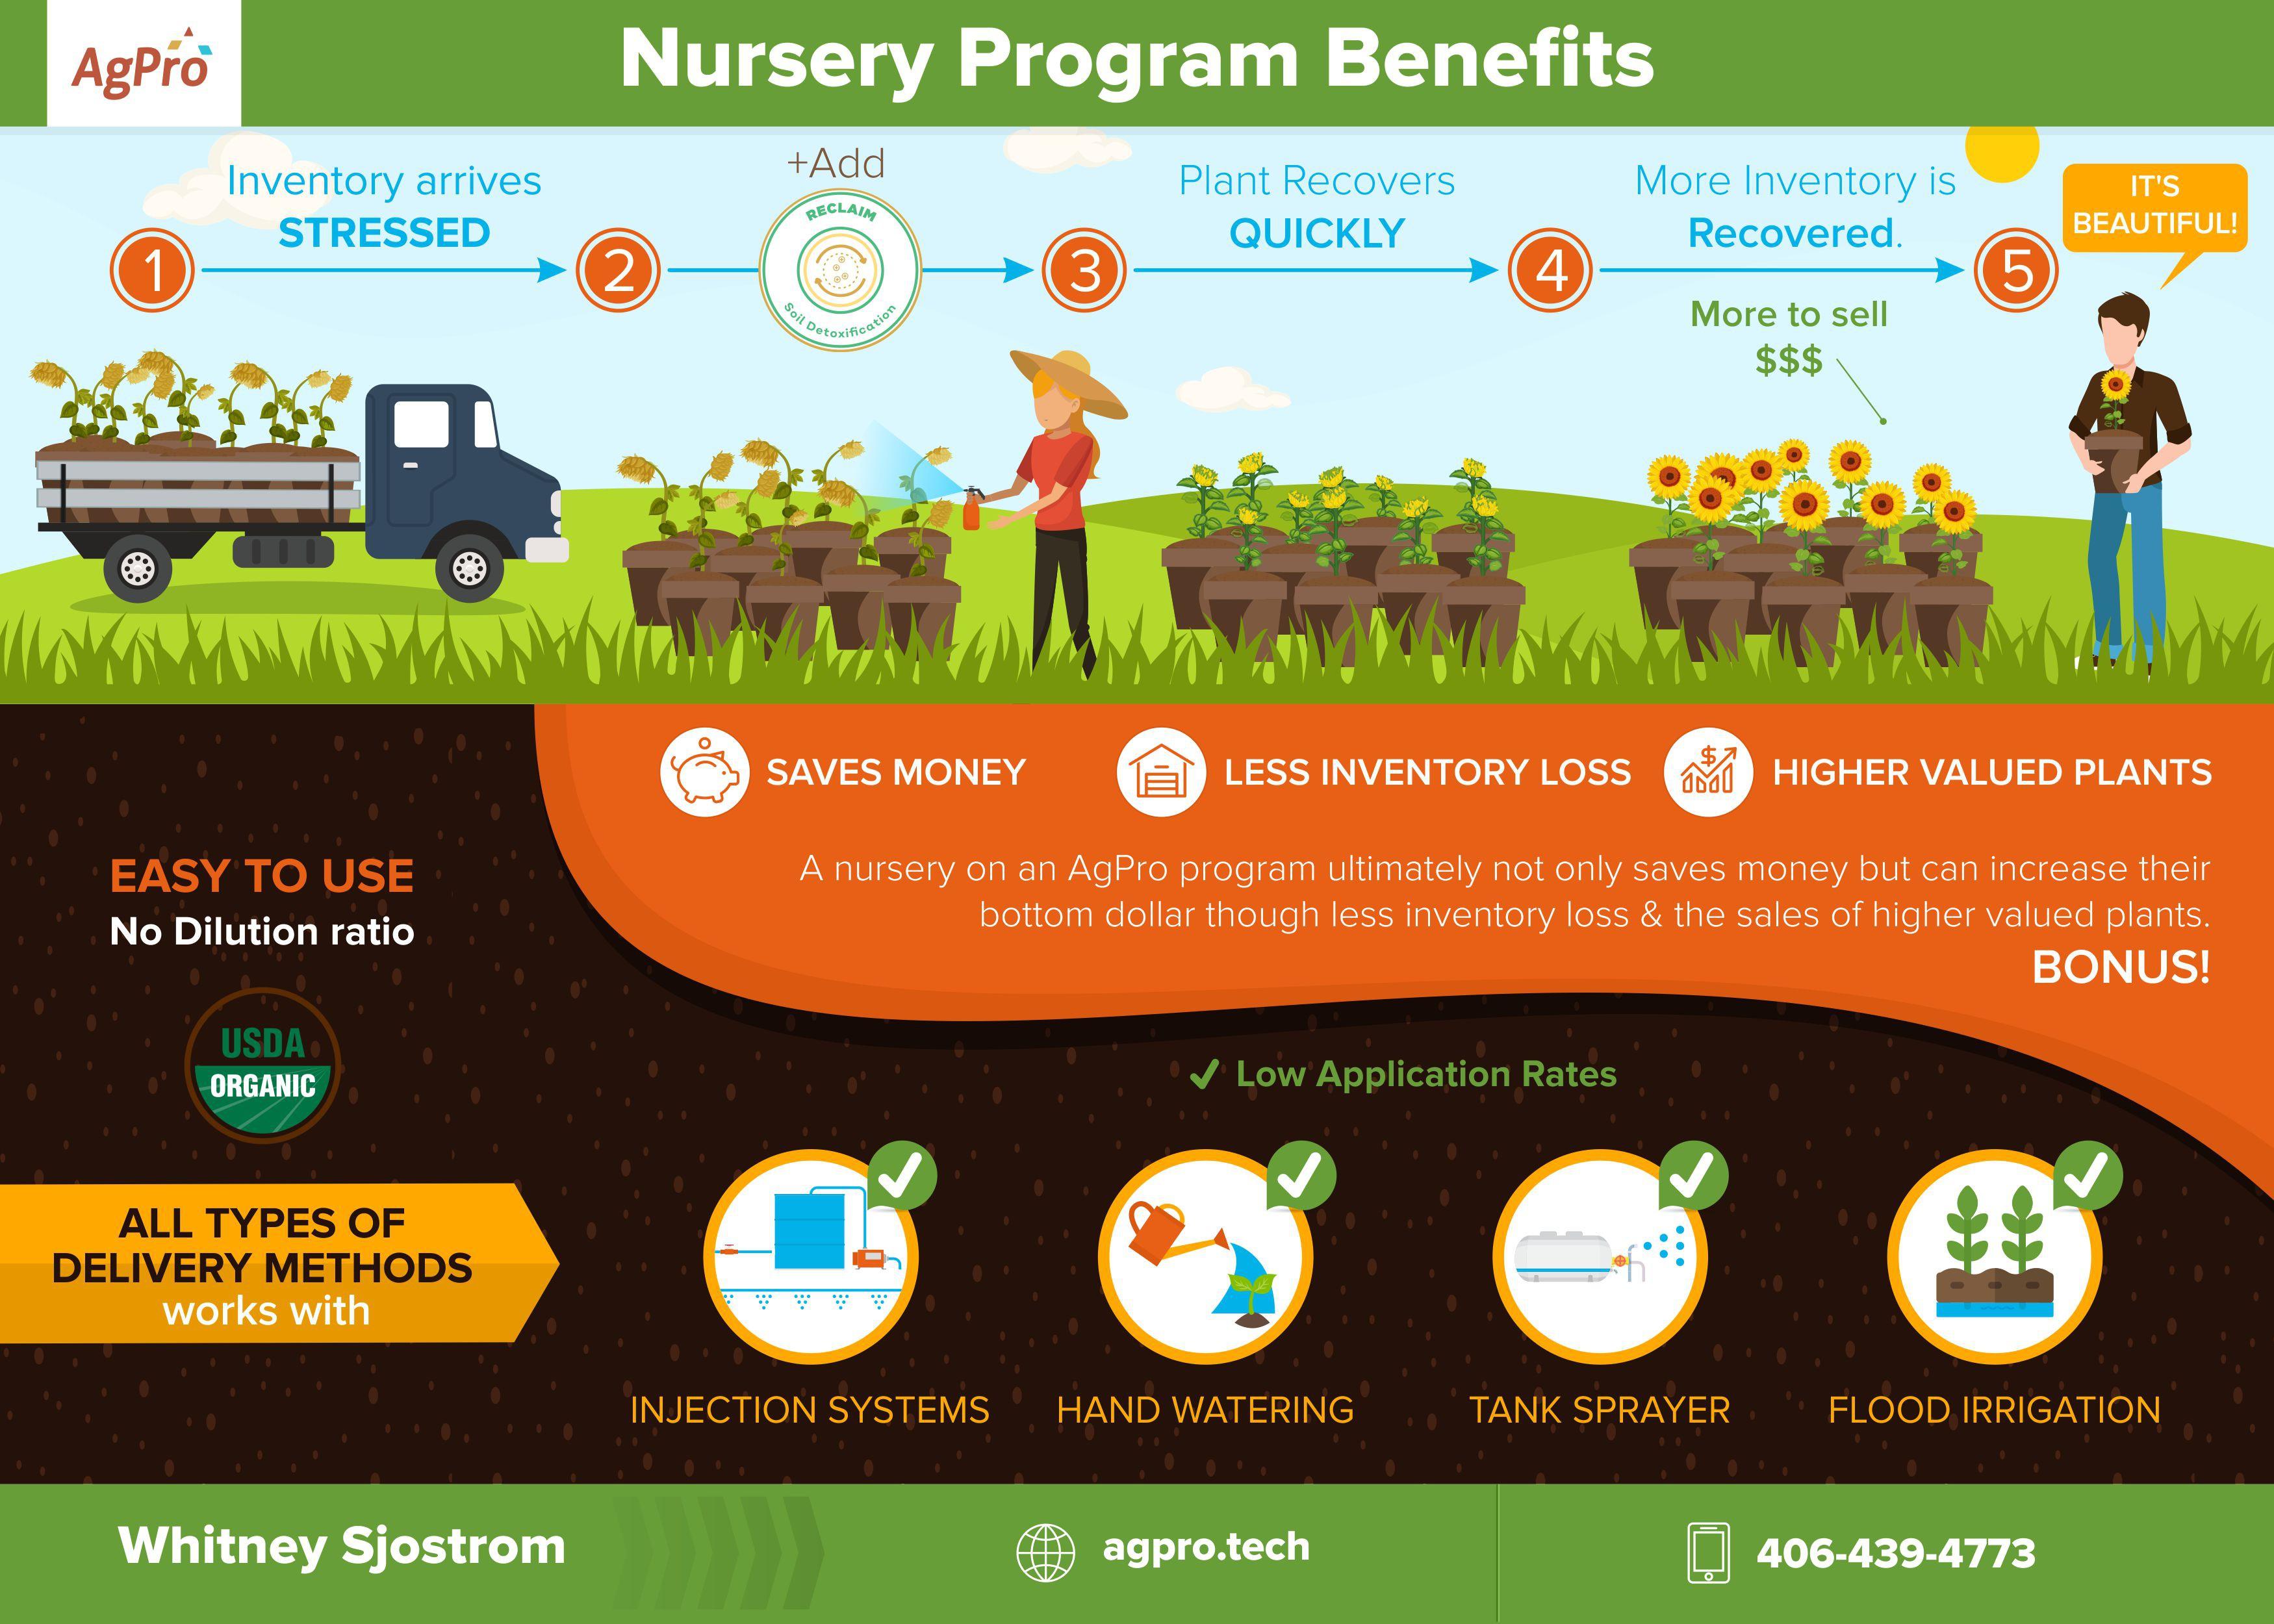 Nursery Programs